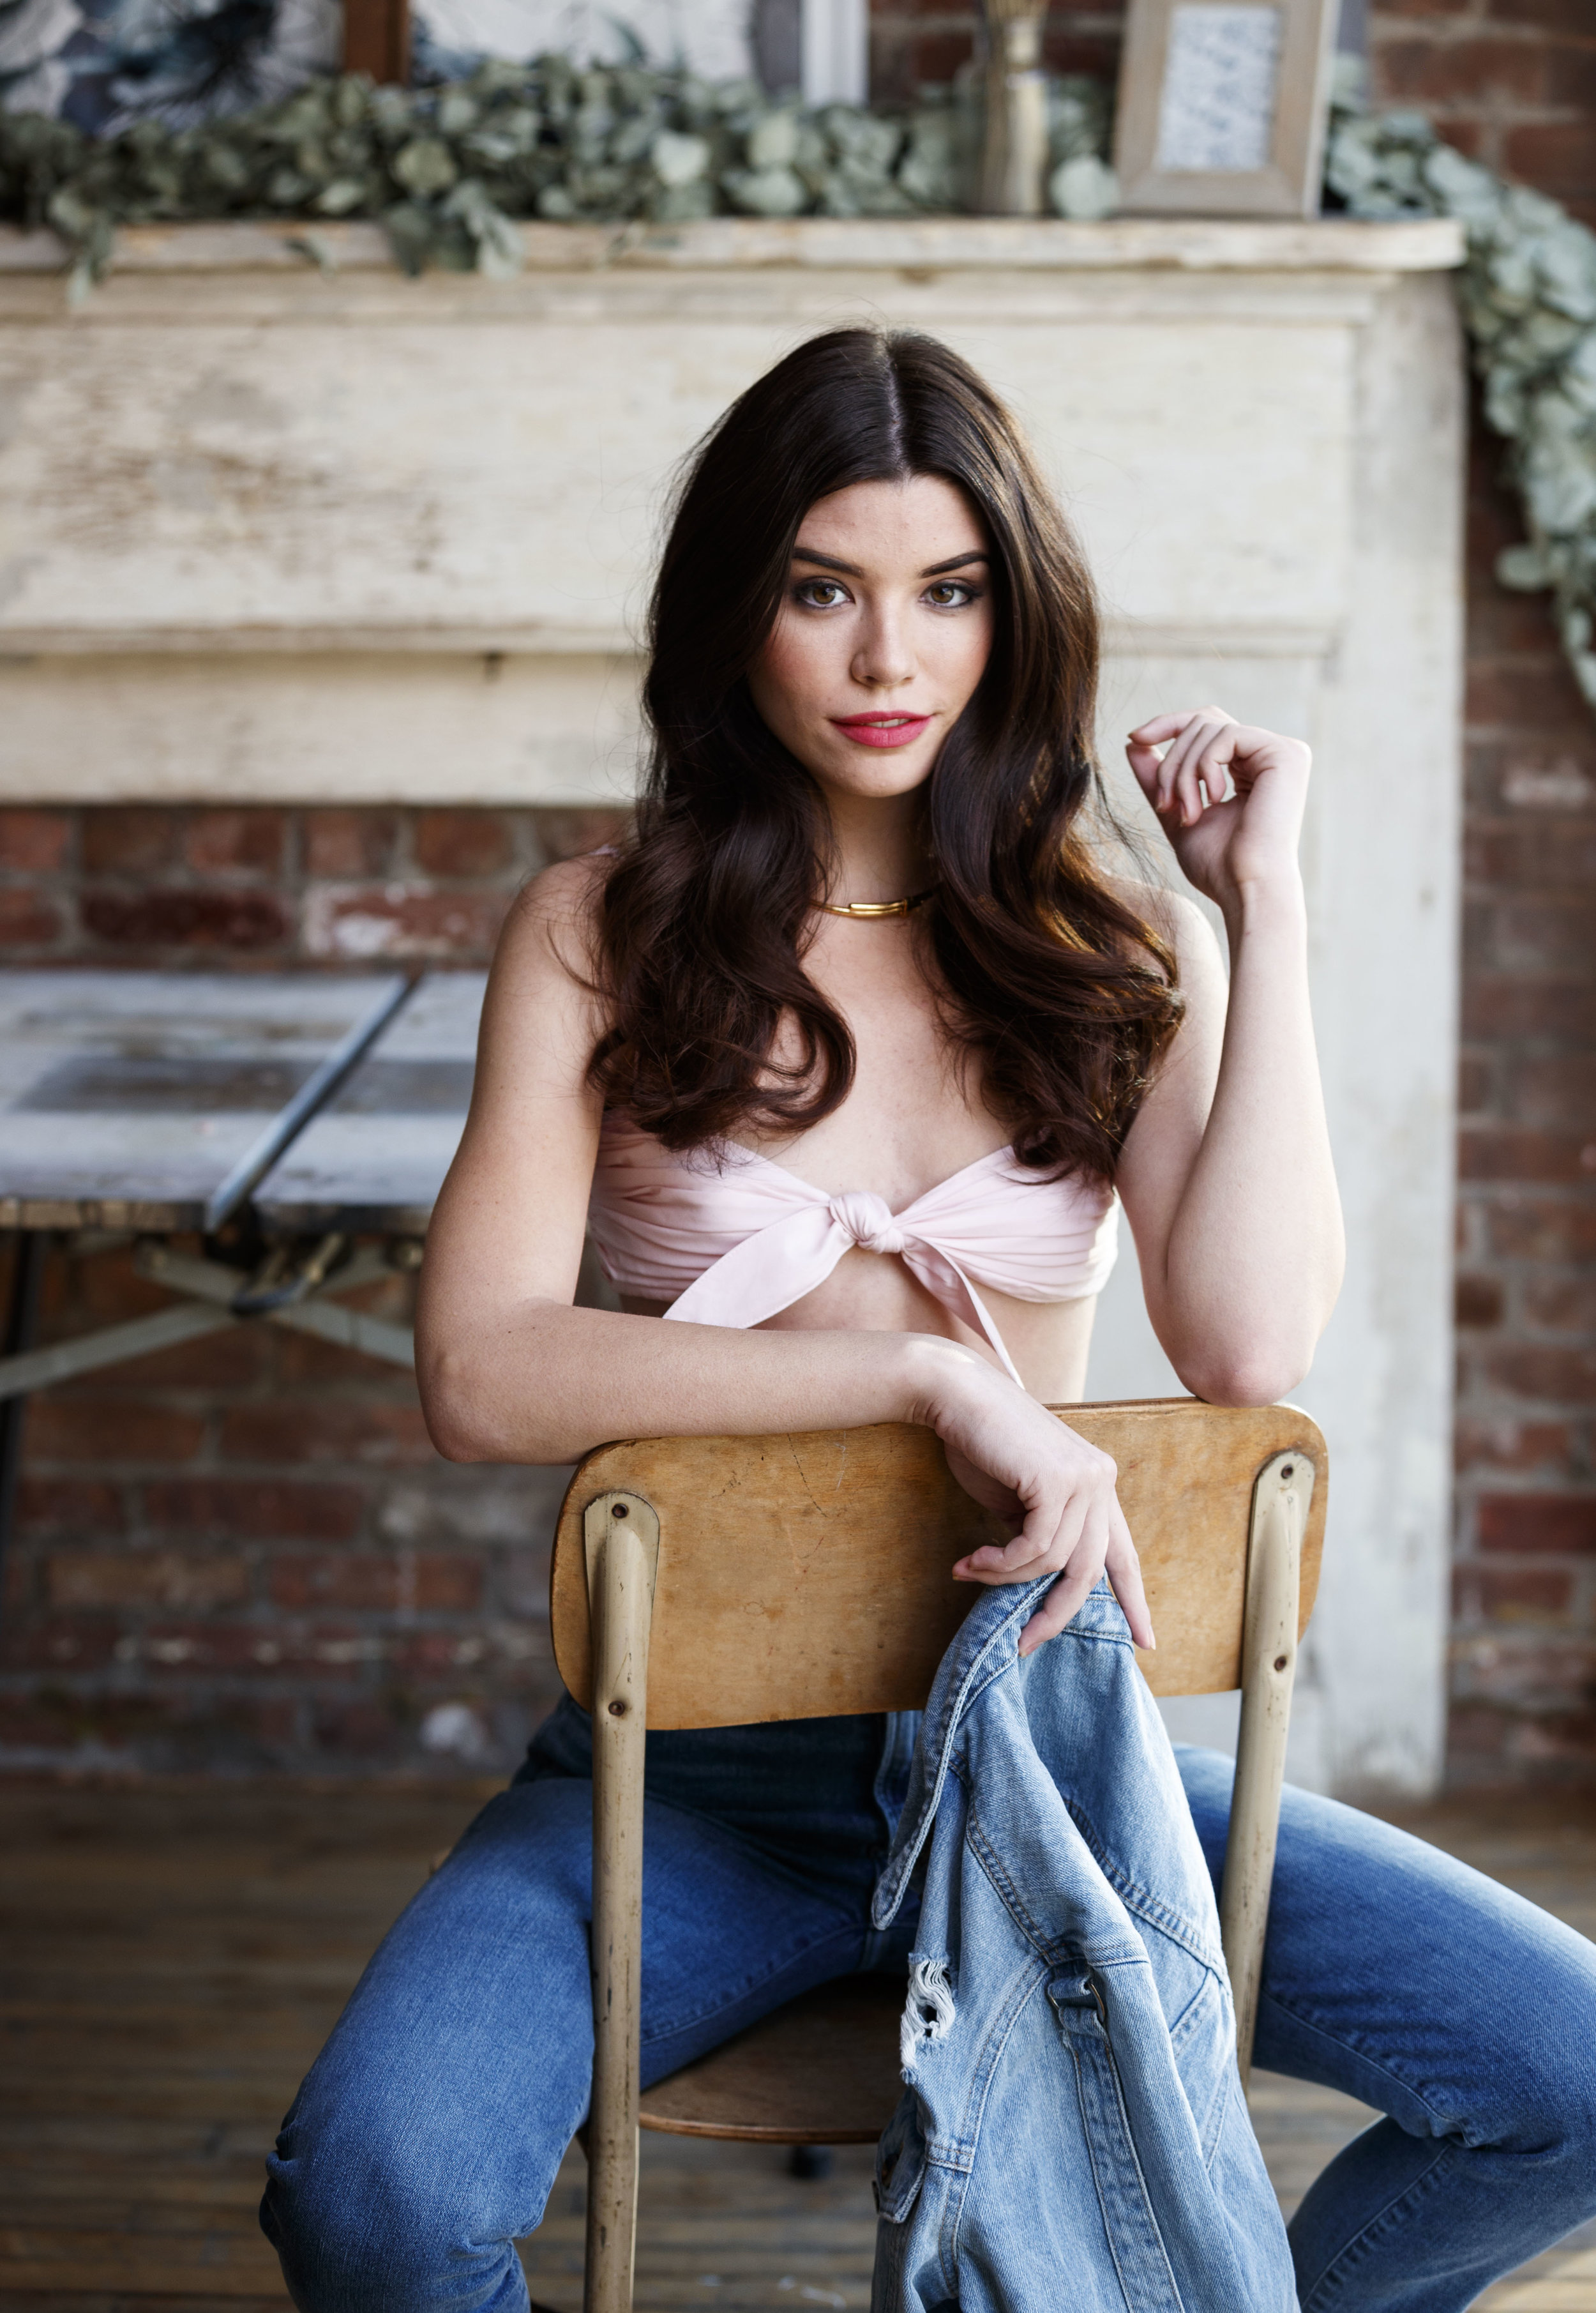 Model Gracie Phillips